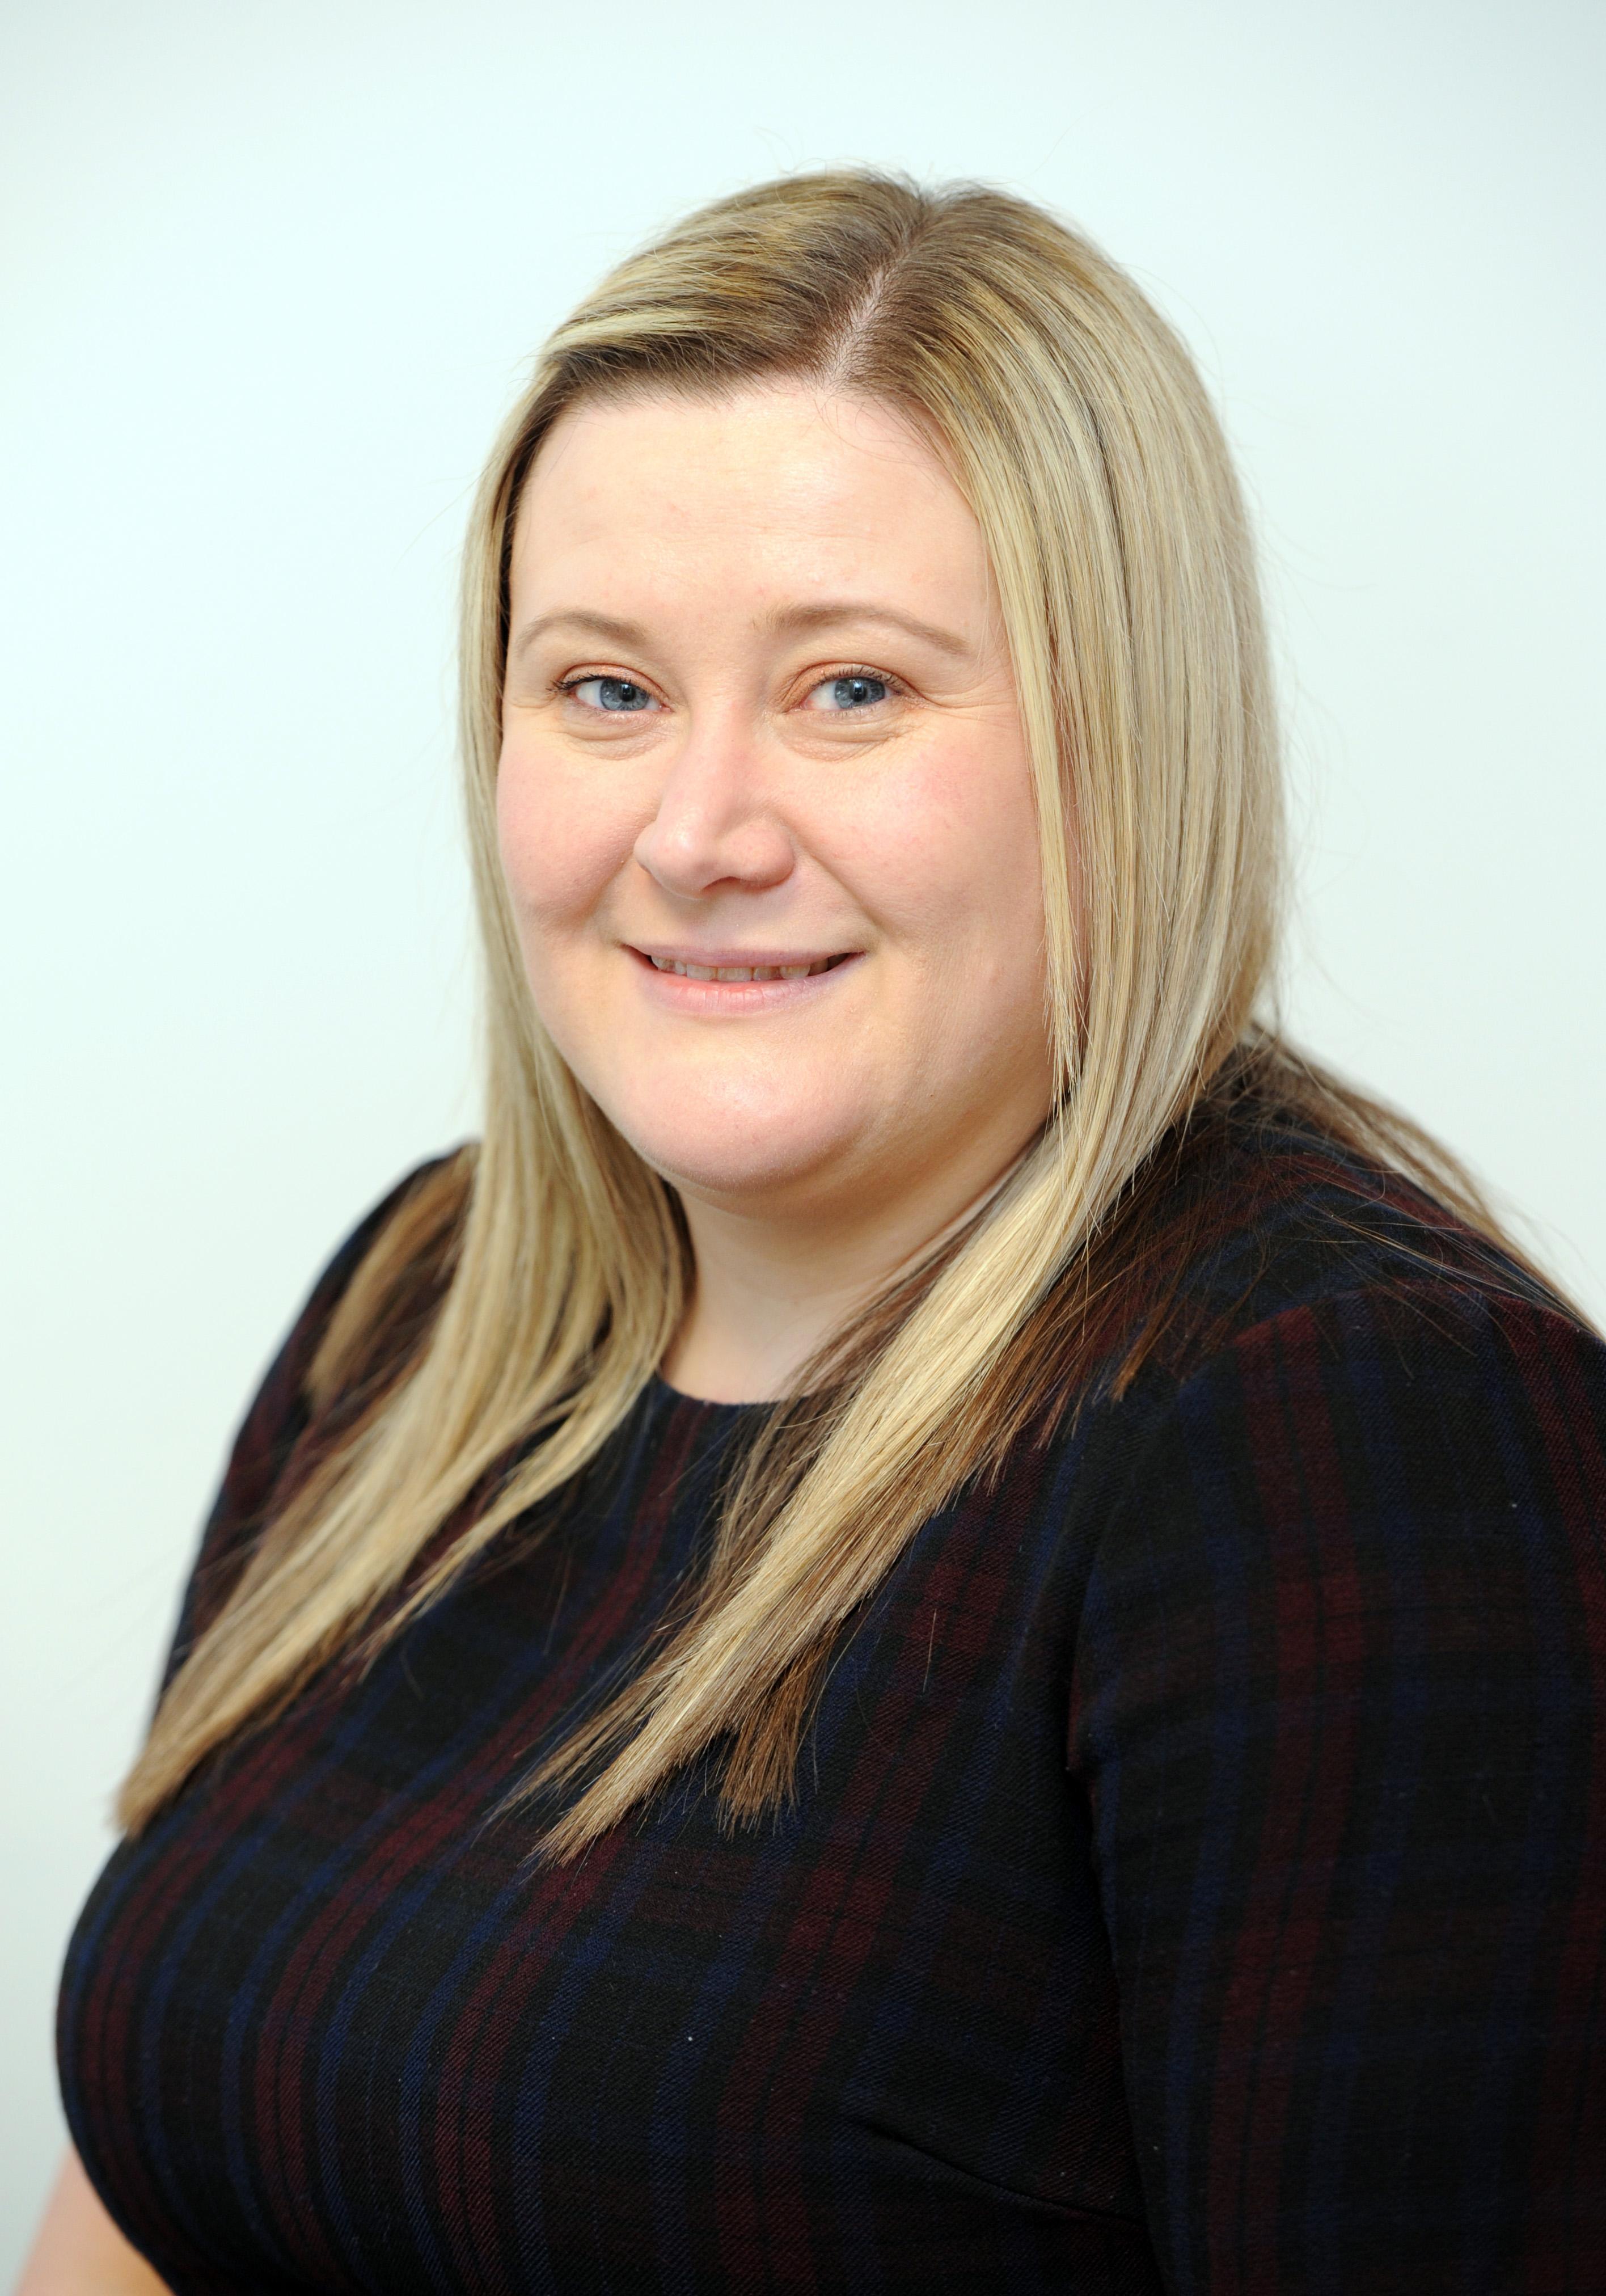 Katie Bolton